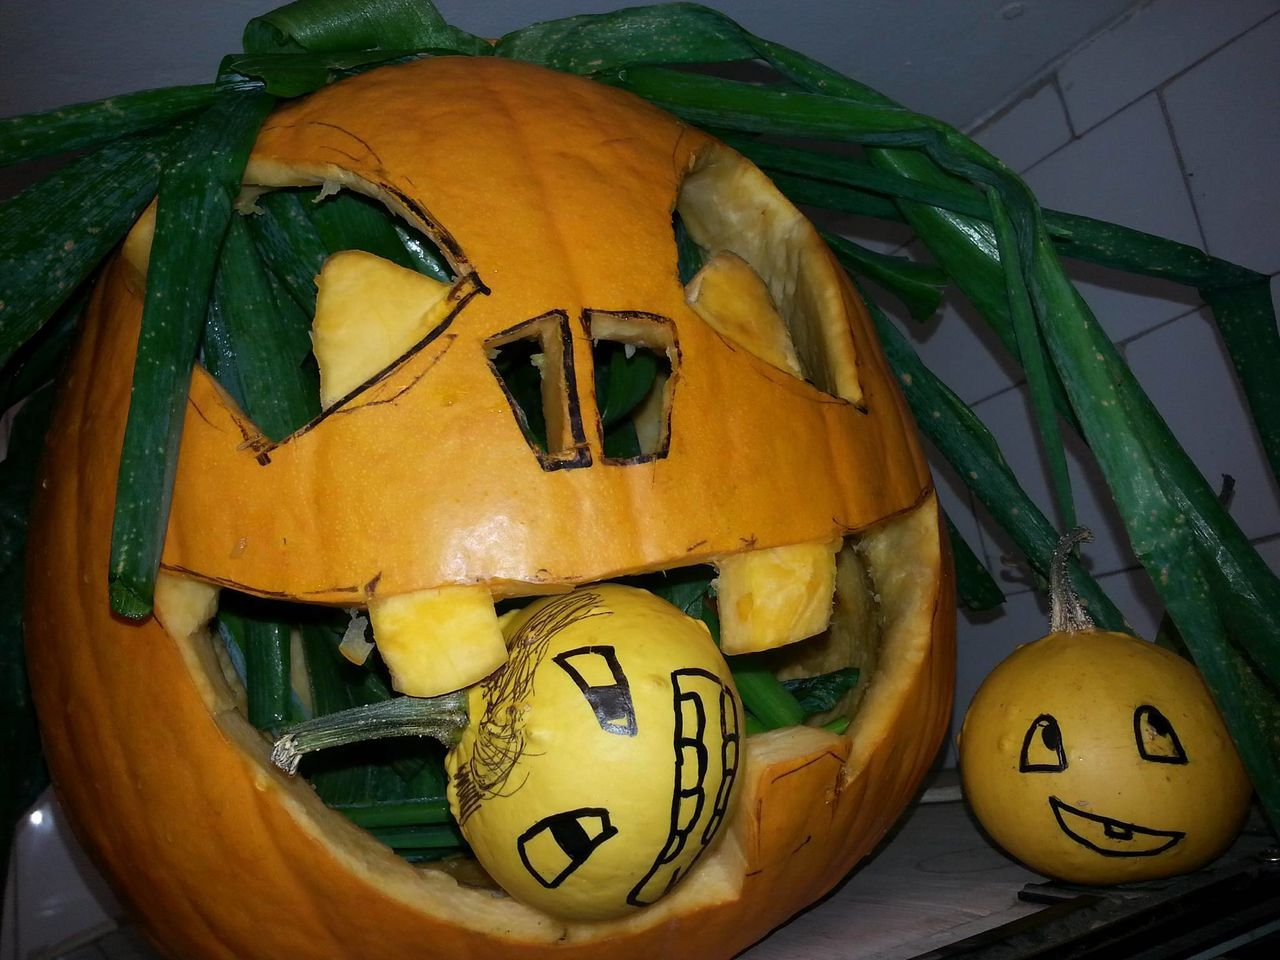 Carved Hallo Halloween EyeEm Halloween Horrors Halloween_Collection Hand-carved Jack O Lantern Pumpkin Pumpkins